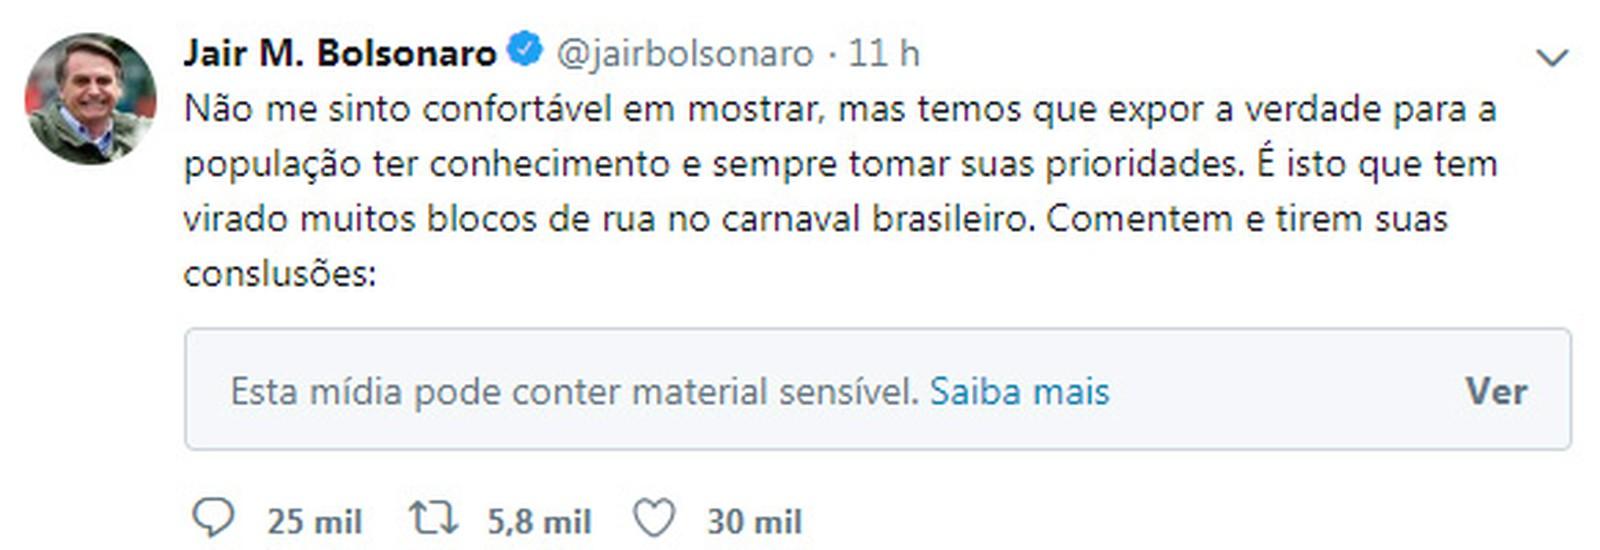 tuite-bolsonaro-restrito